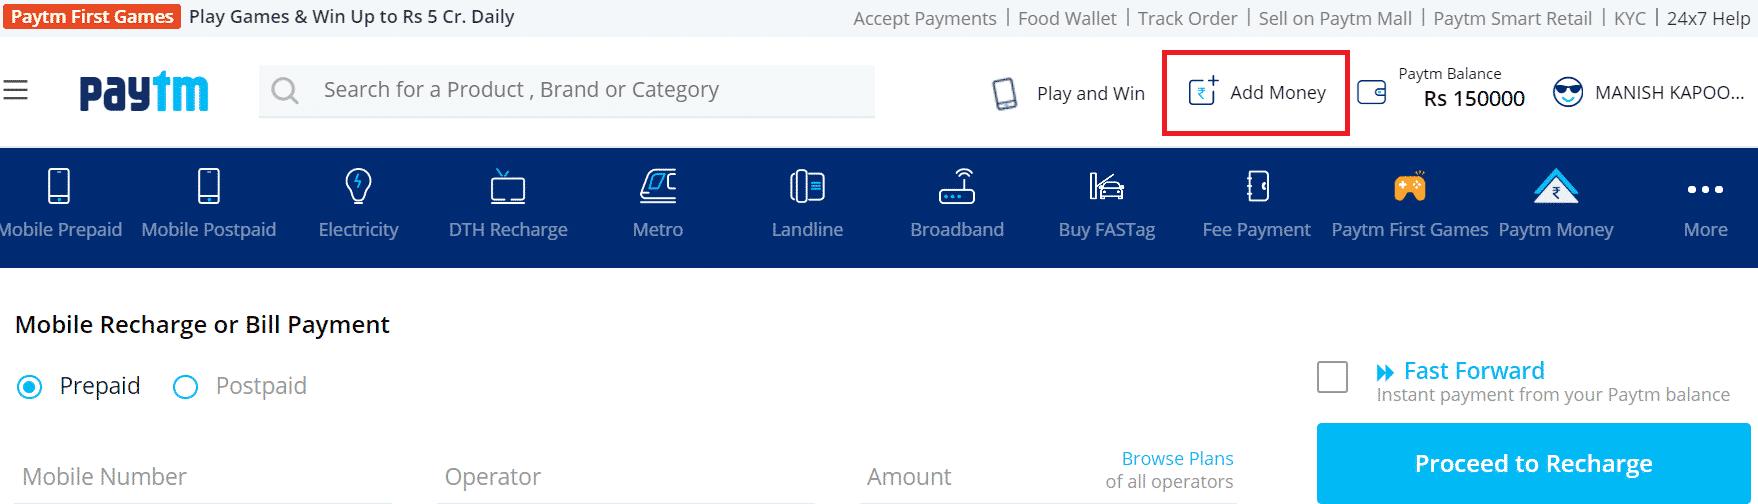 paytm wallet or add money icon